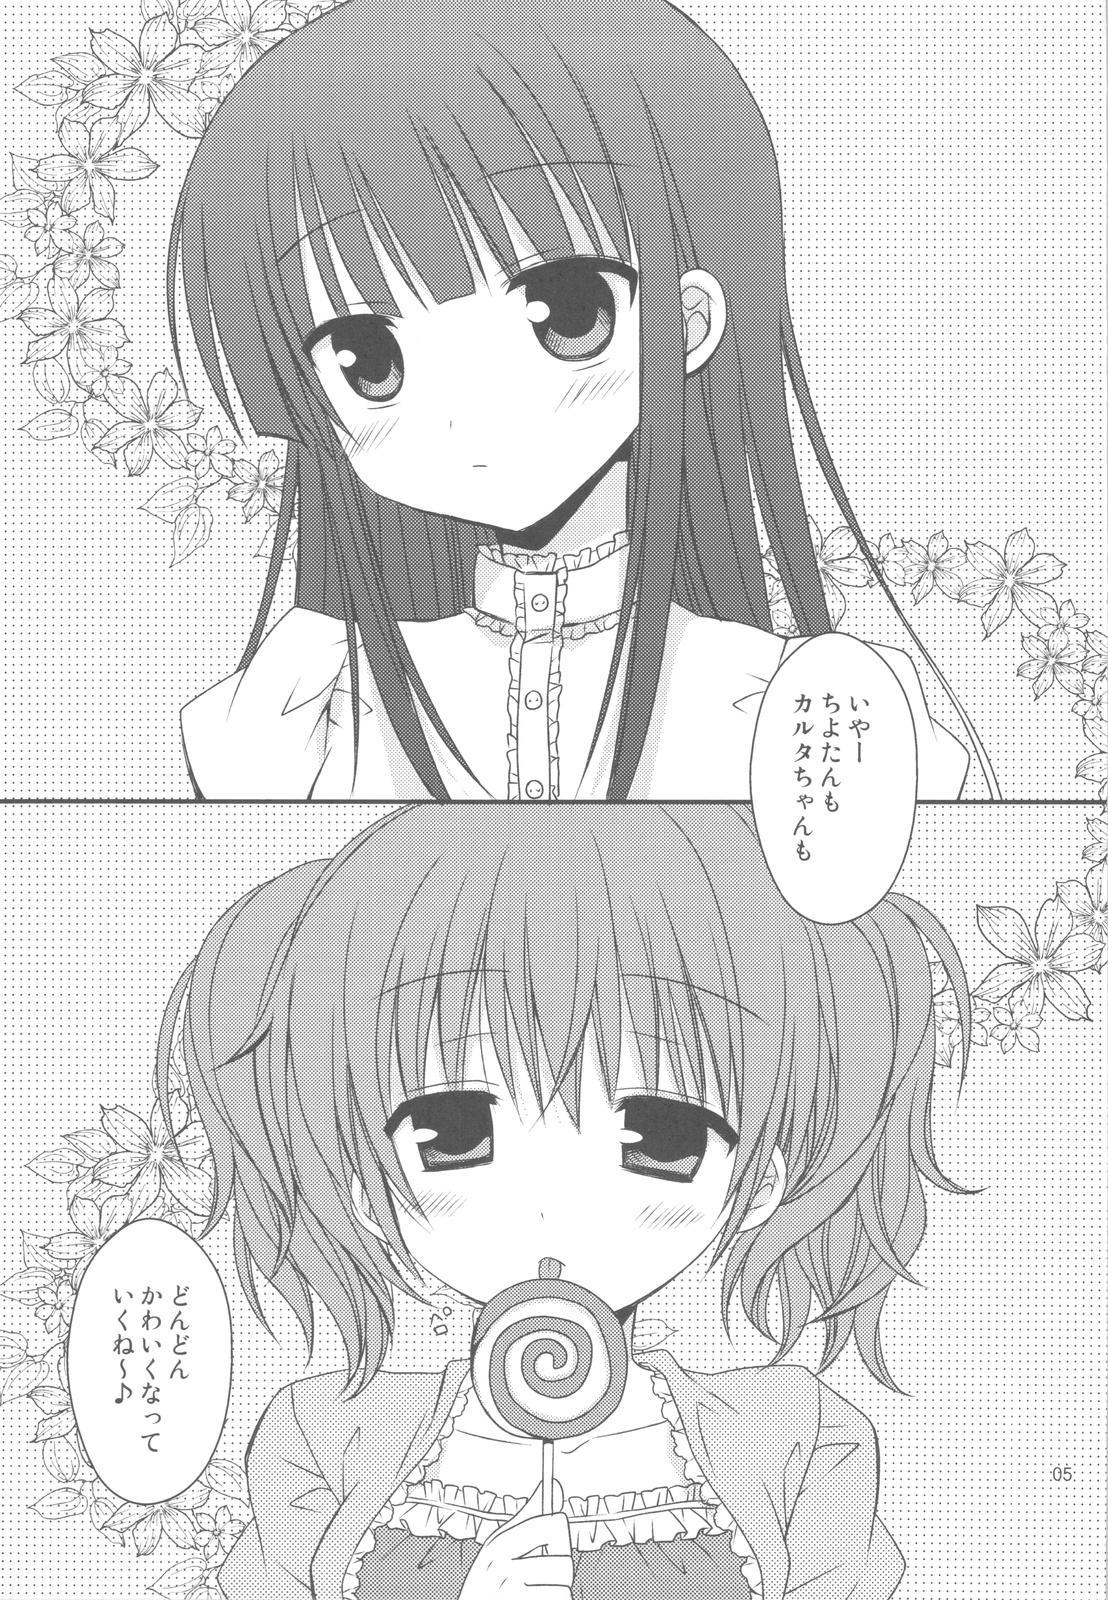 Chiisana Ai no Monogatari 3